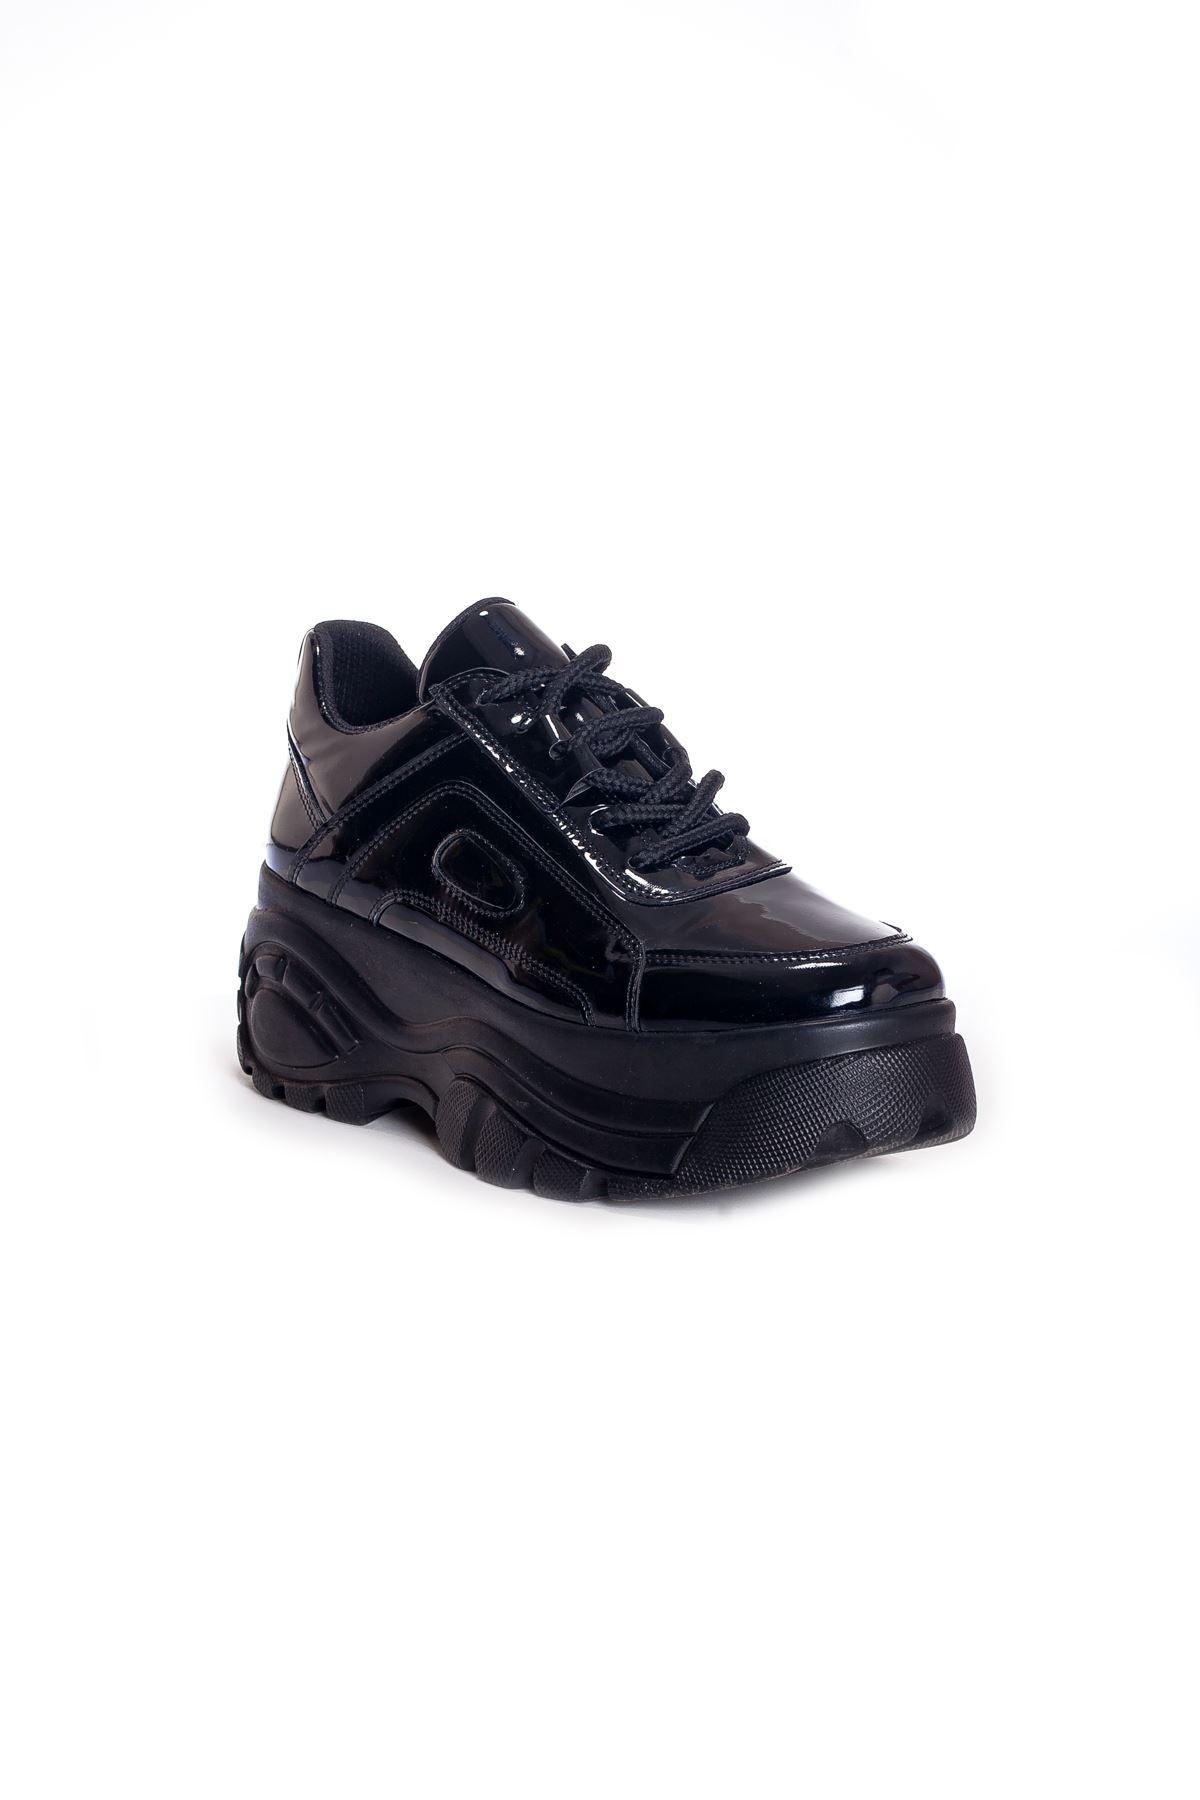 Ck-107 Siyah Rugan Spor Ayakkabı